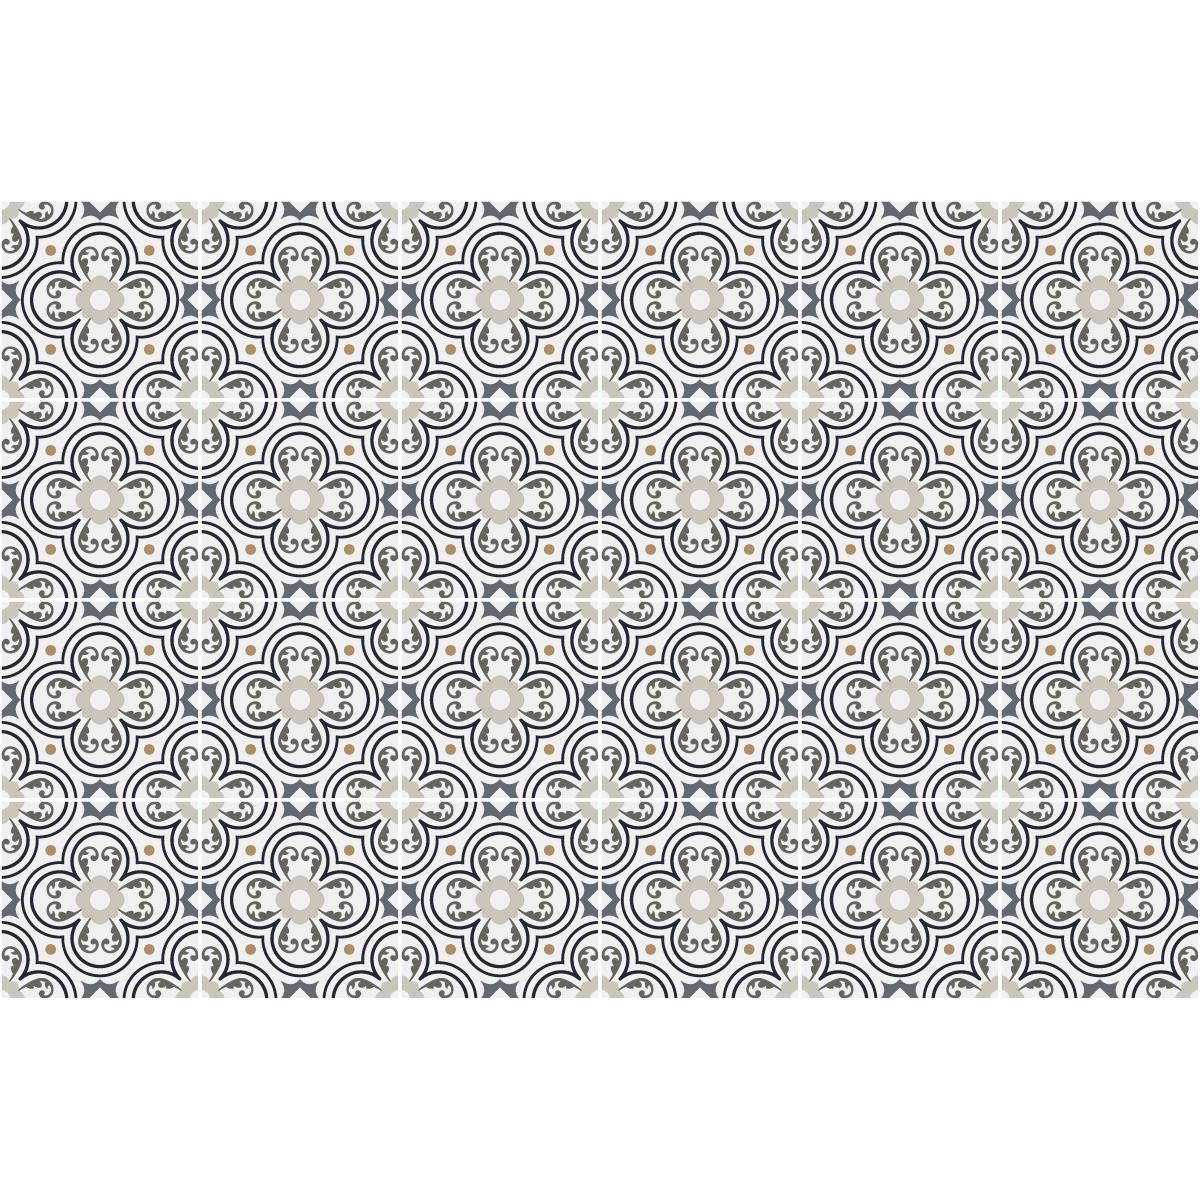 24 stickers carreaux de ciment azulejos graciano cuisine. Black Bedroom Furniture Sets. Home Design Ideas